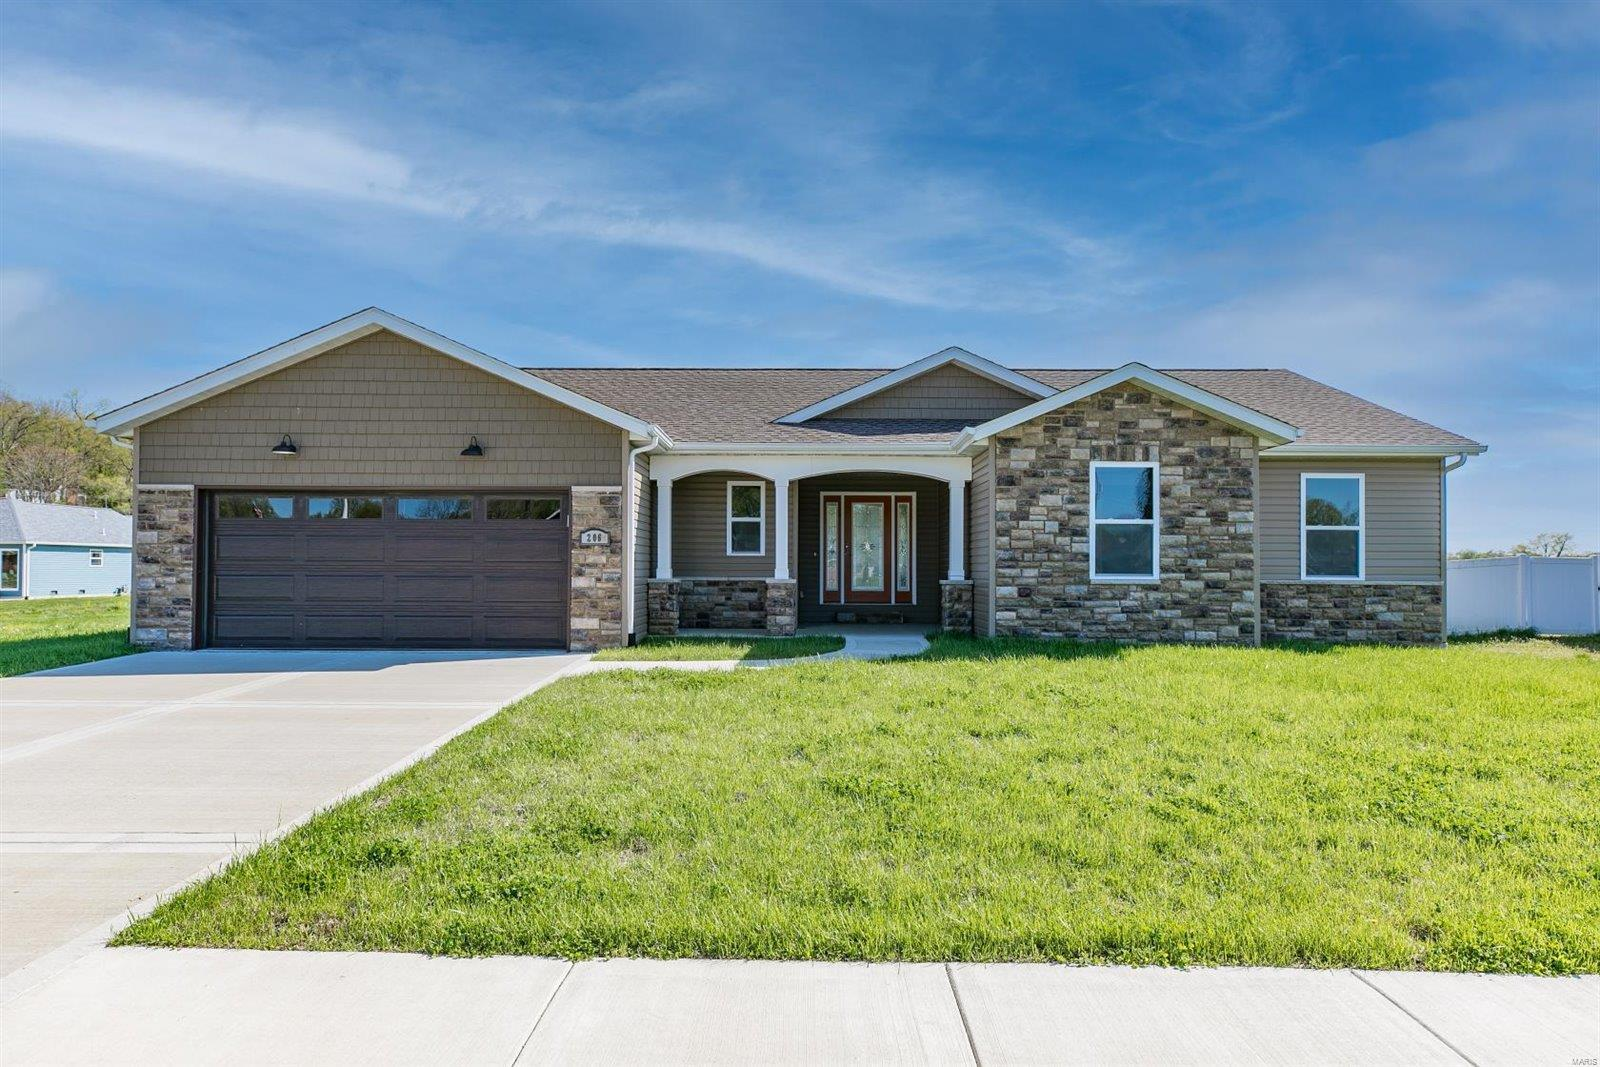 206 Geaschel Drive Property Photo - Caseyville, IL real estate listing